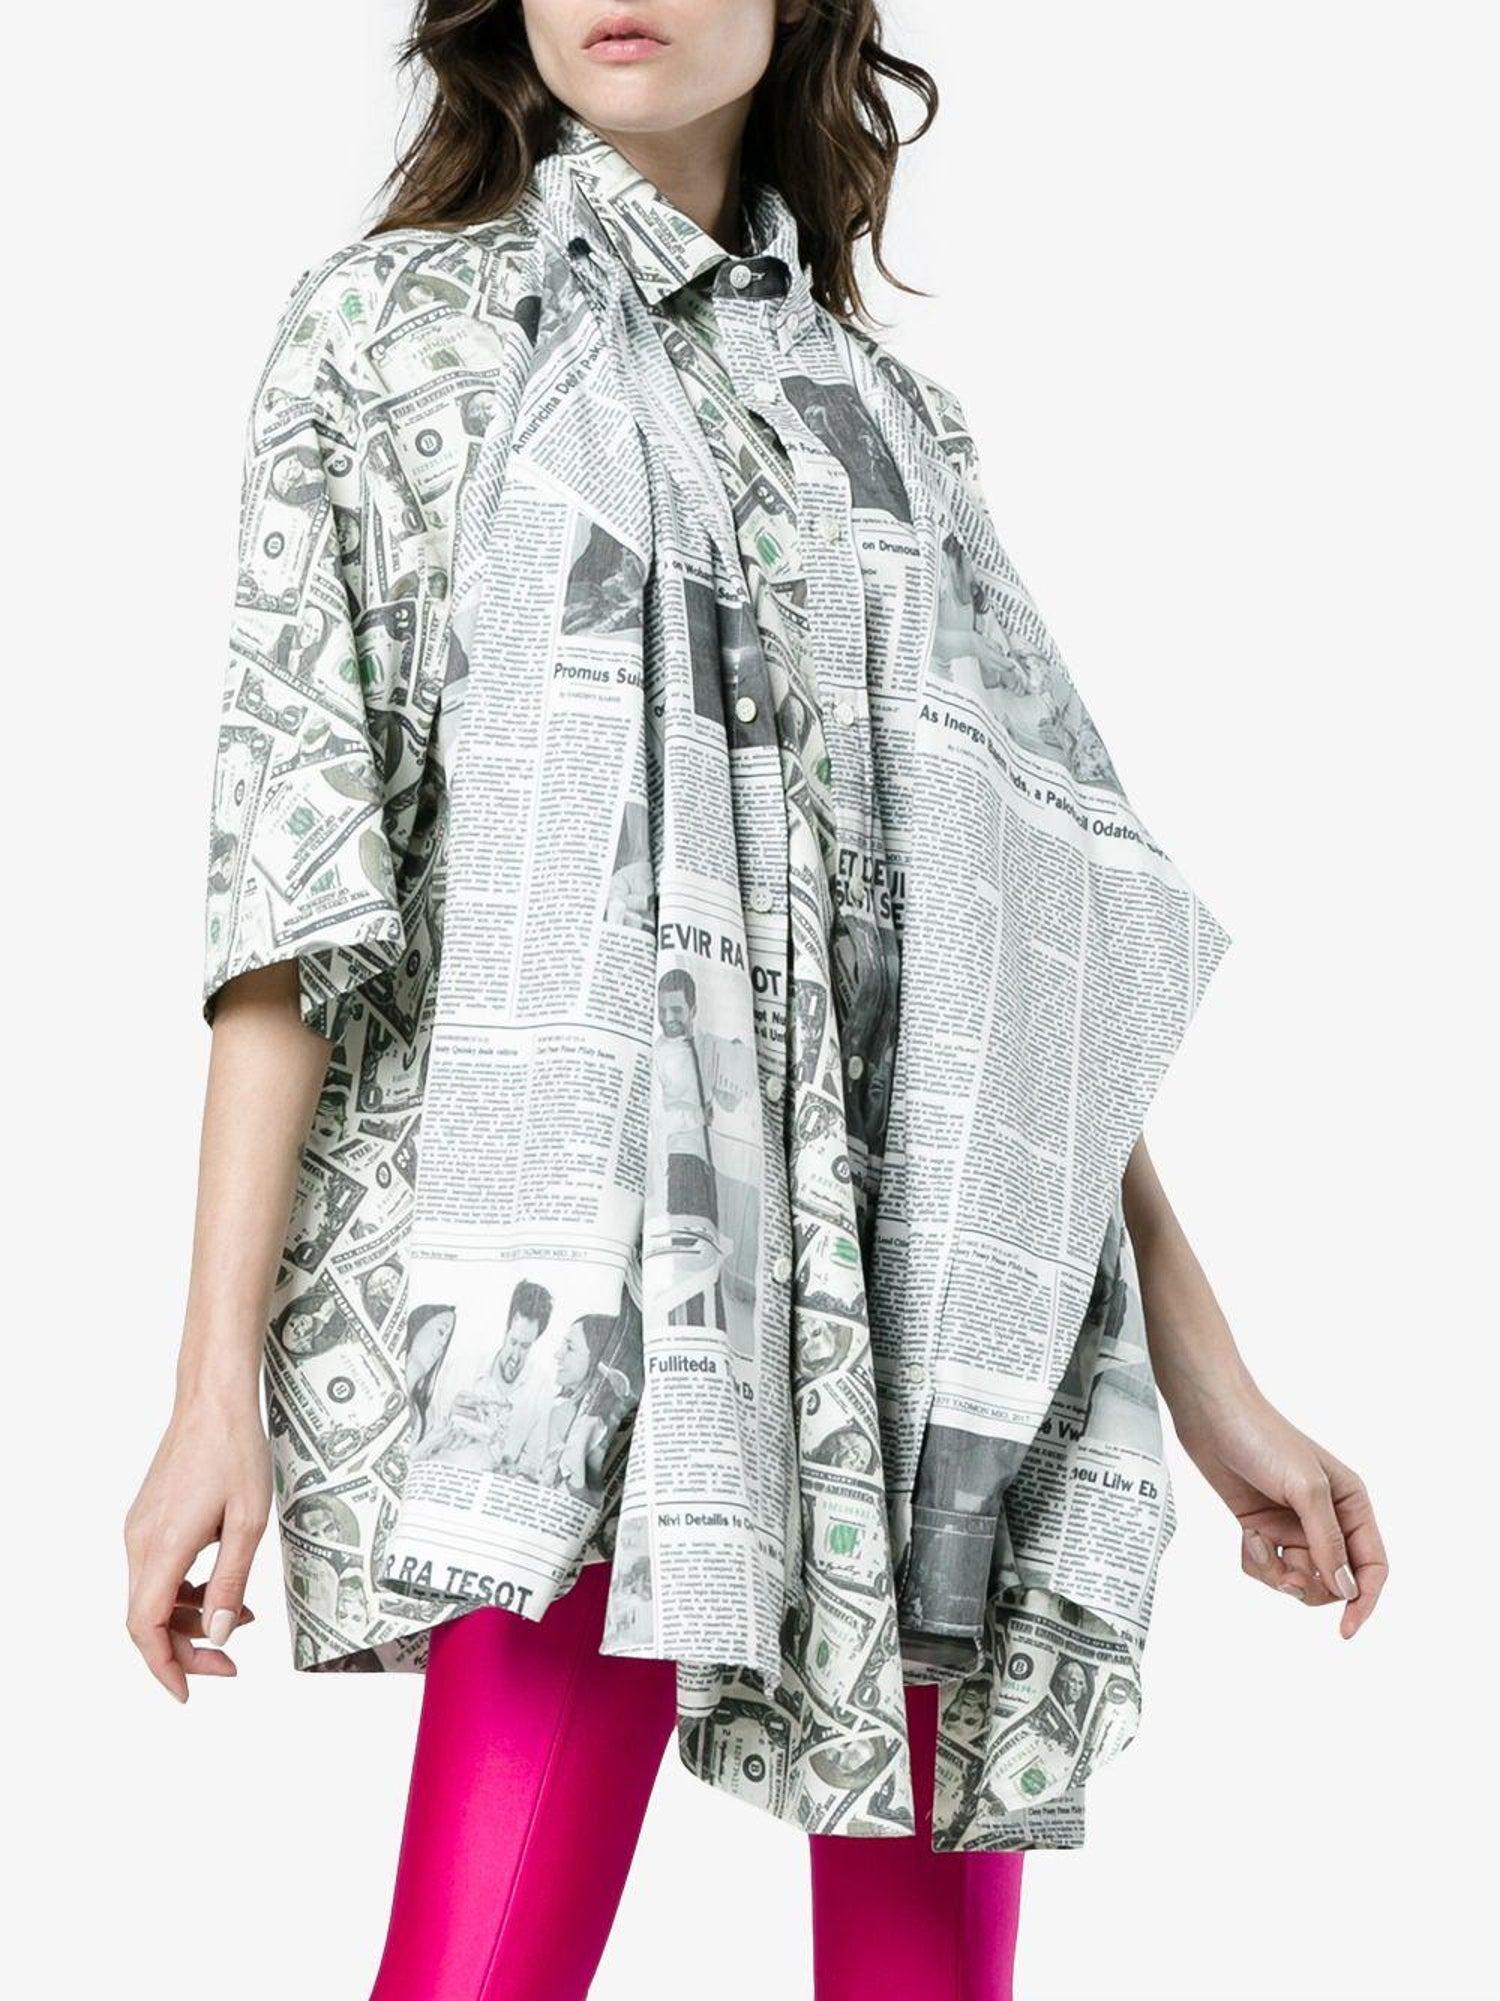 d9d991a4 Balenciaga Money $$ Print Shirt Oversized Size 40 NEW For Sale at 1stdibs